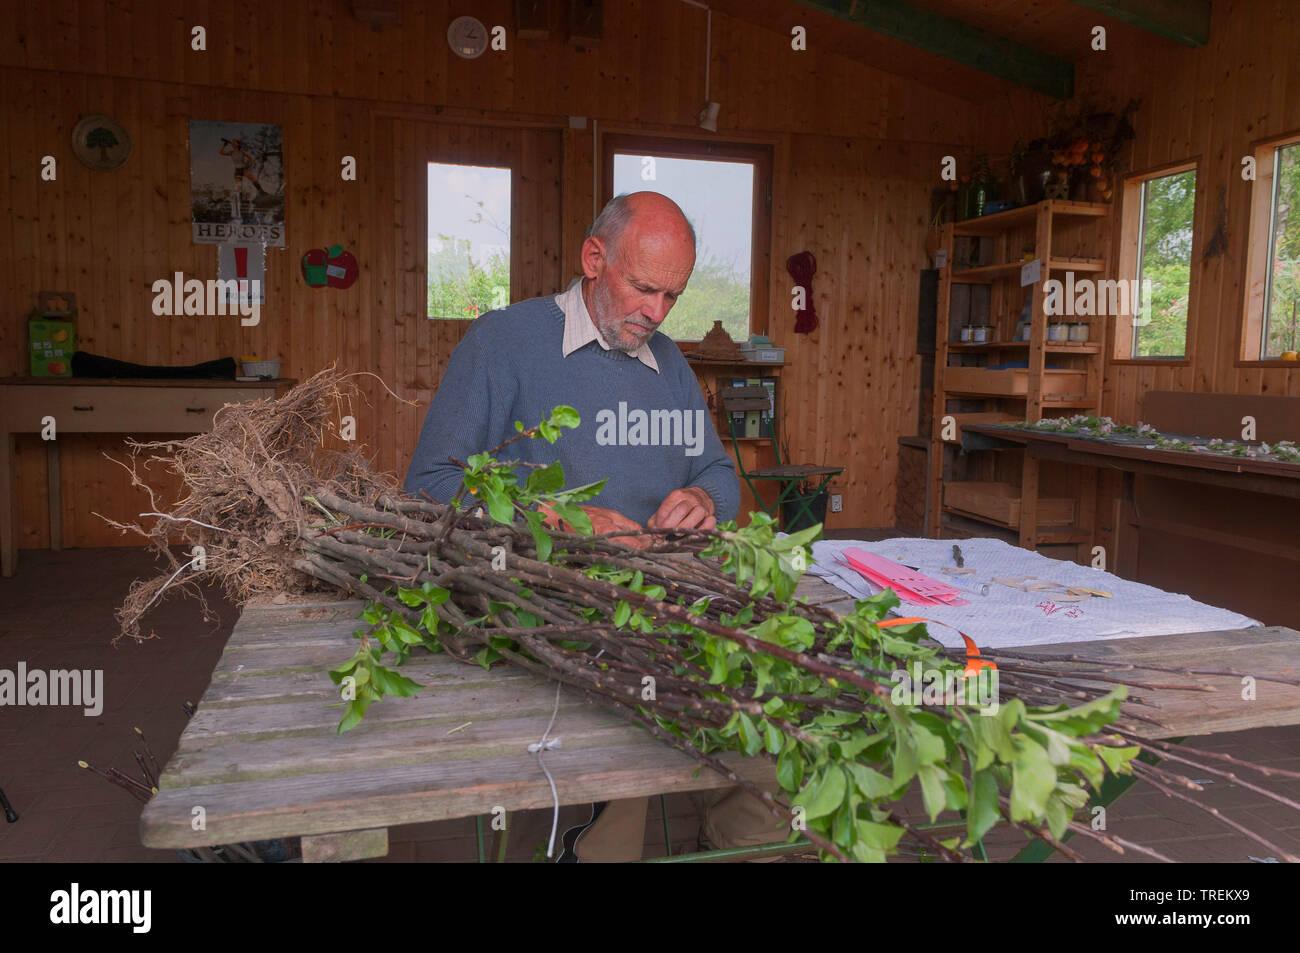 Apfelbaum, Kultur-Apfel, Kulturapfel (Malus domestica), Gaertner bereitet Wurzelware fuer den Verkauf vor, Deutschland | apple tree (Malus domestica), - Stock Image